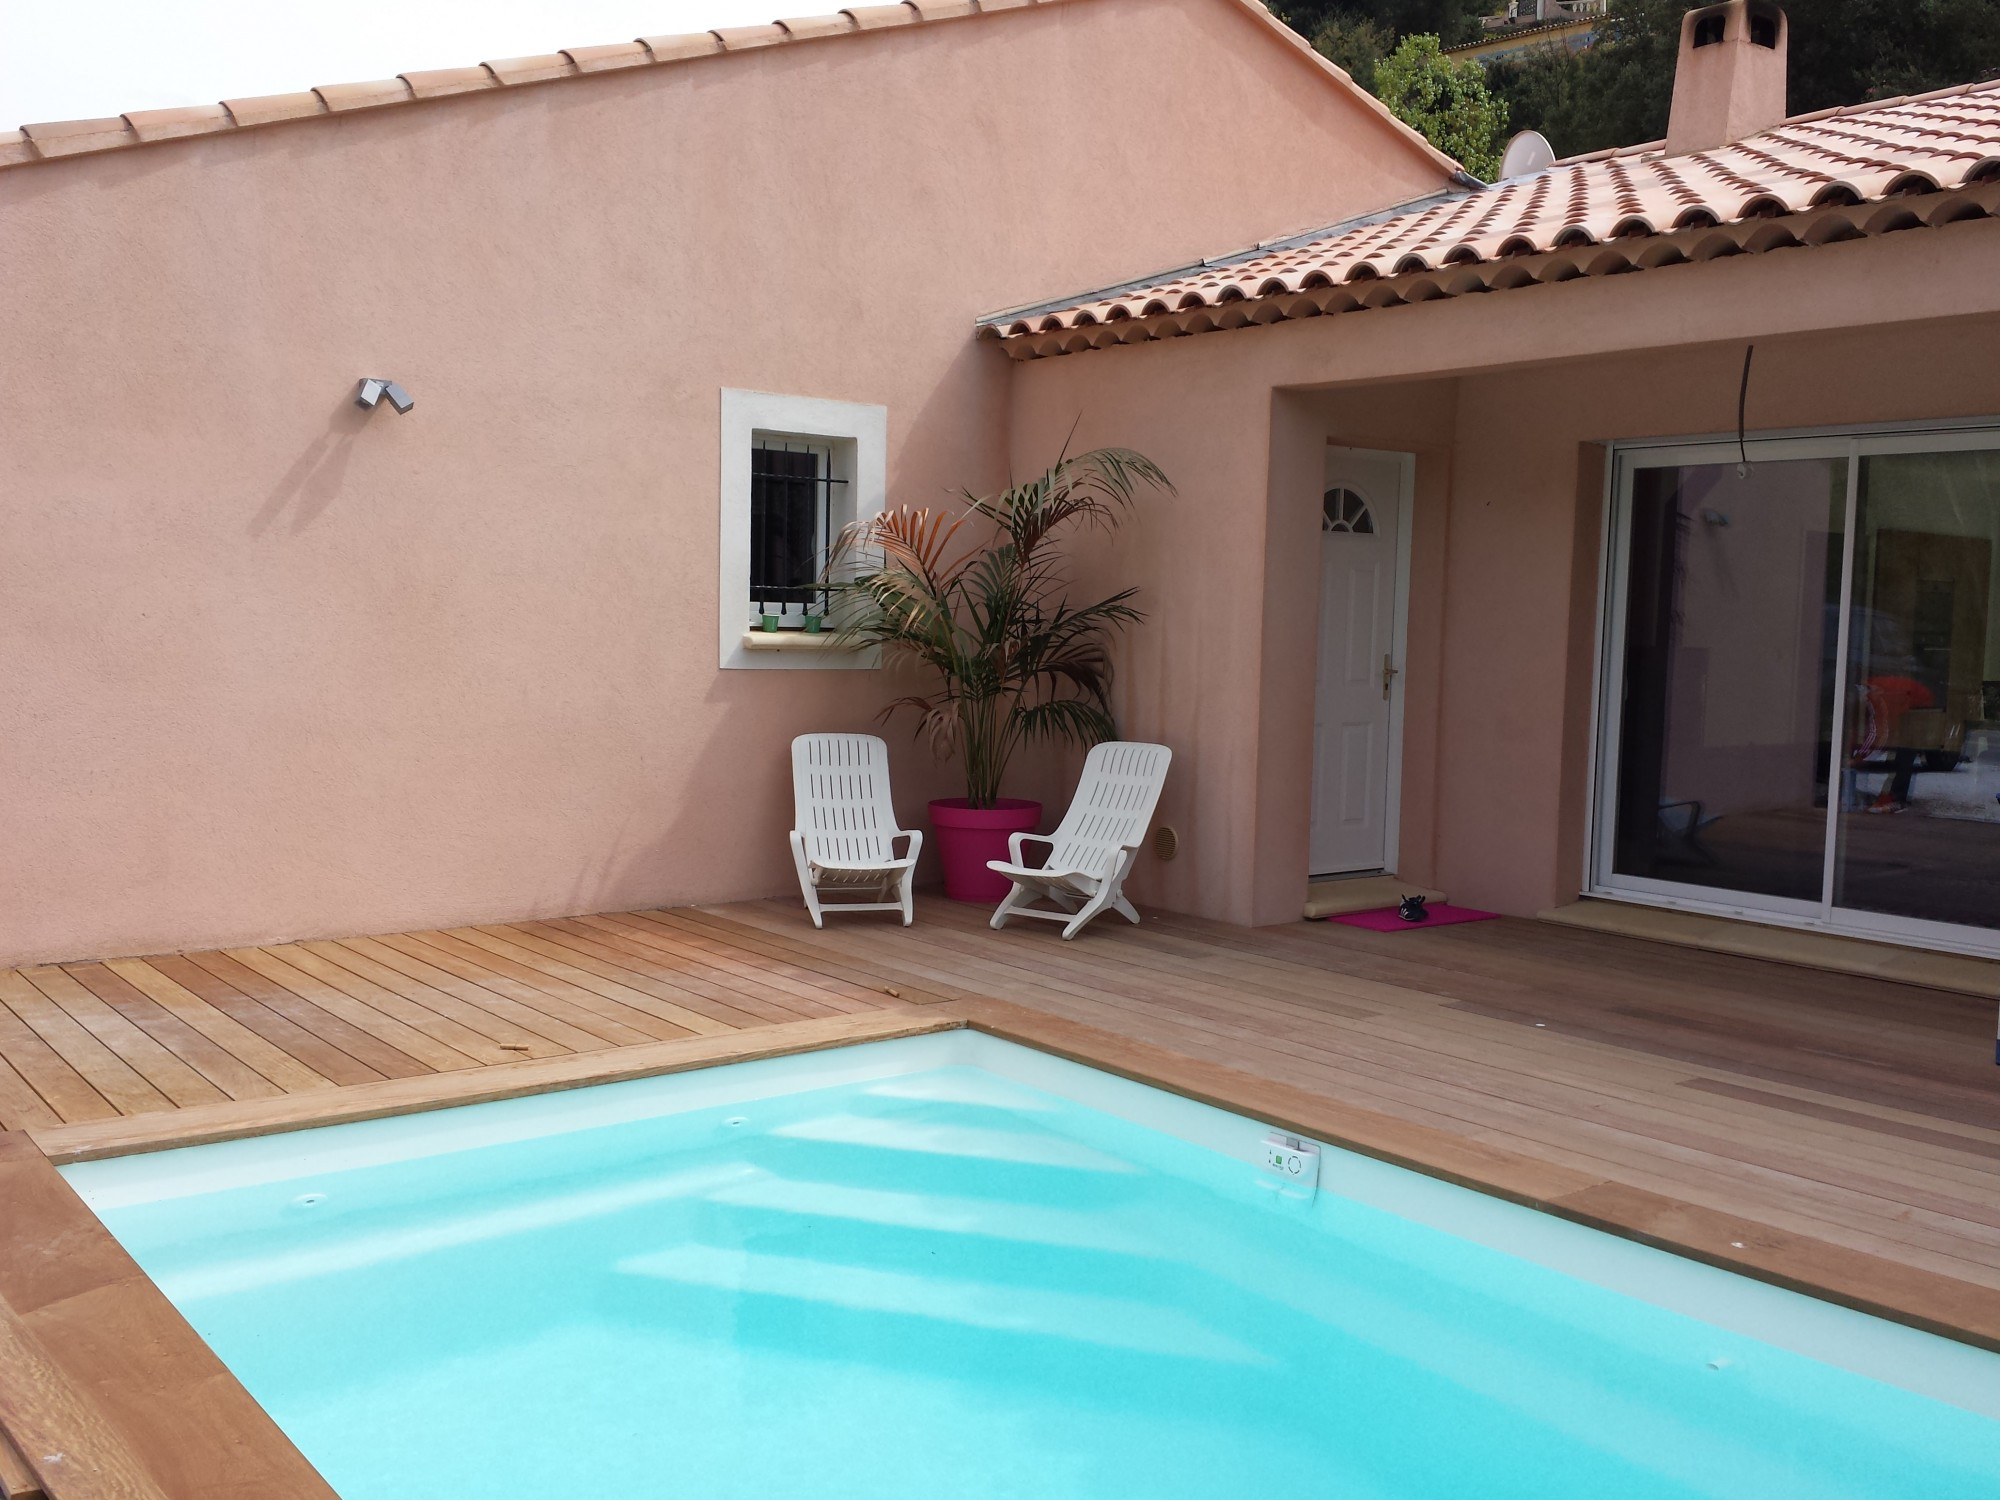 celestine 5 piscine coque alliance piscines fond plat. Black Bedroom Furniture Sets. Home Design Ideas